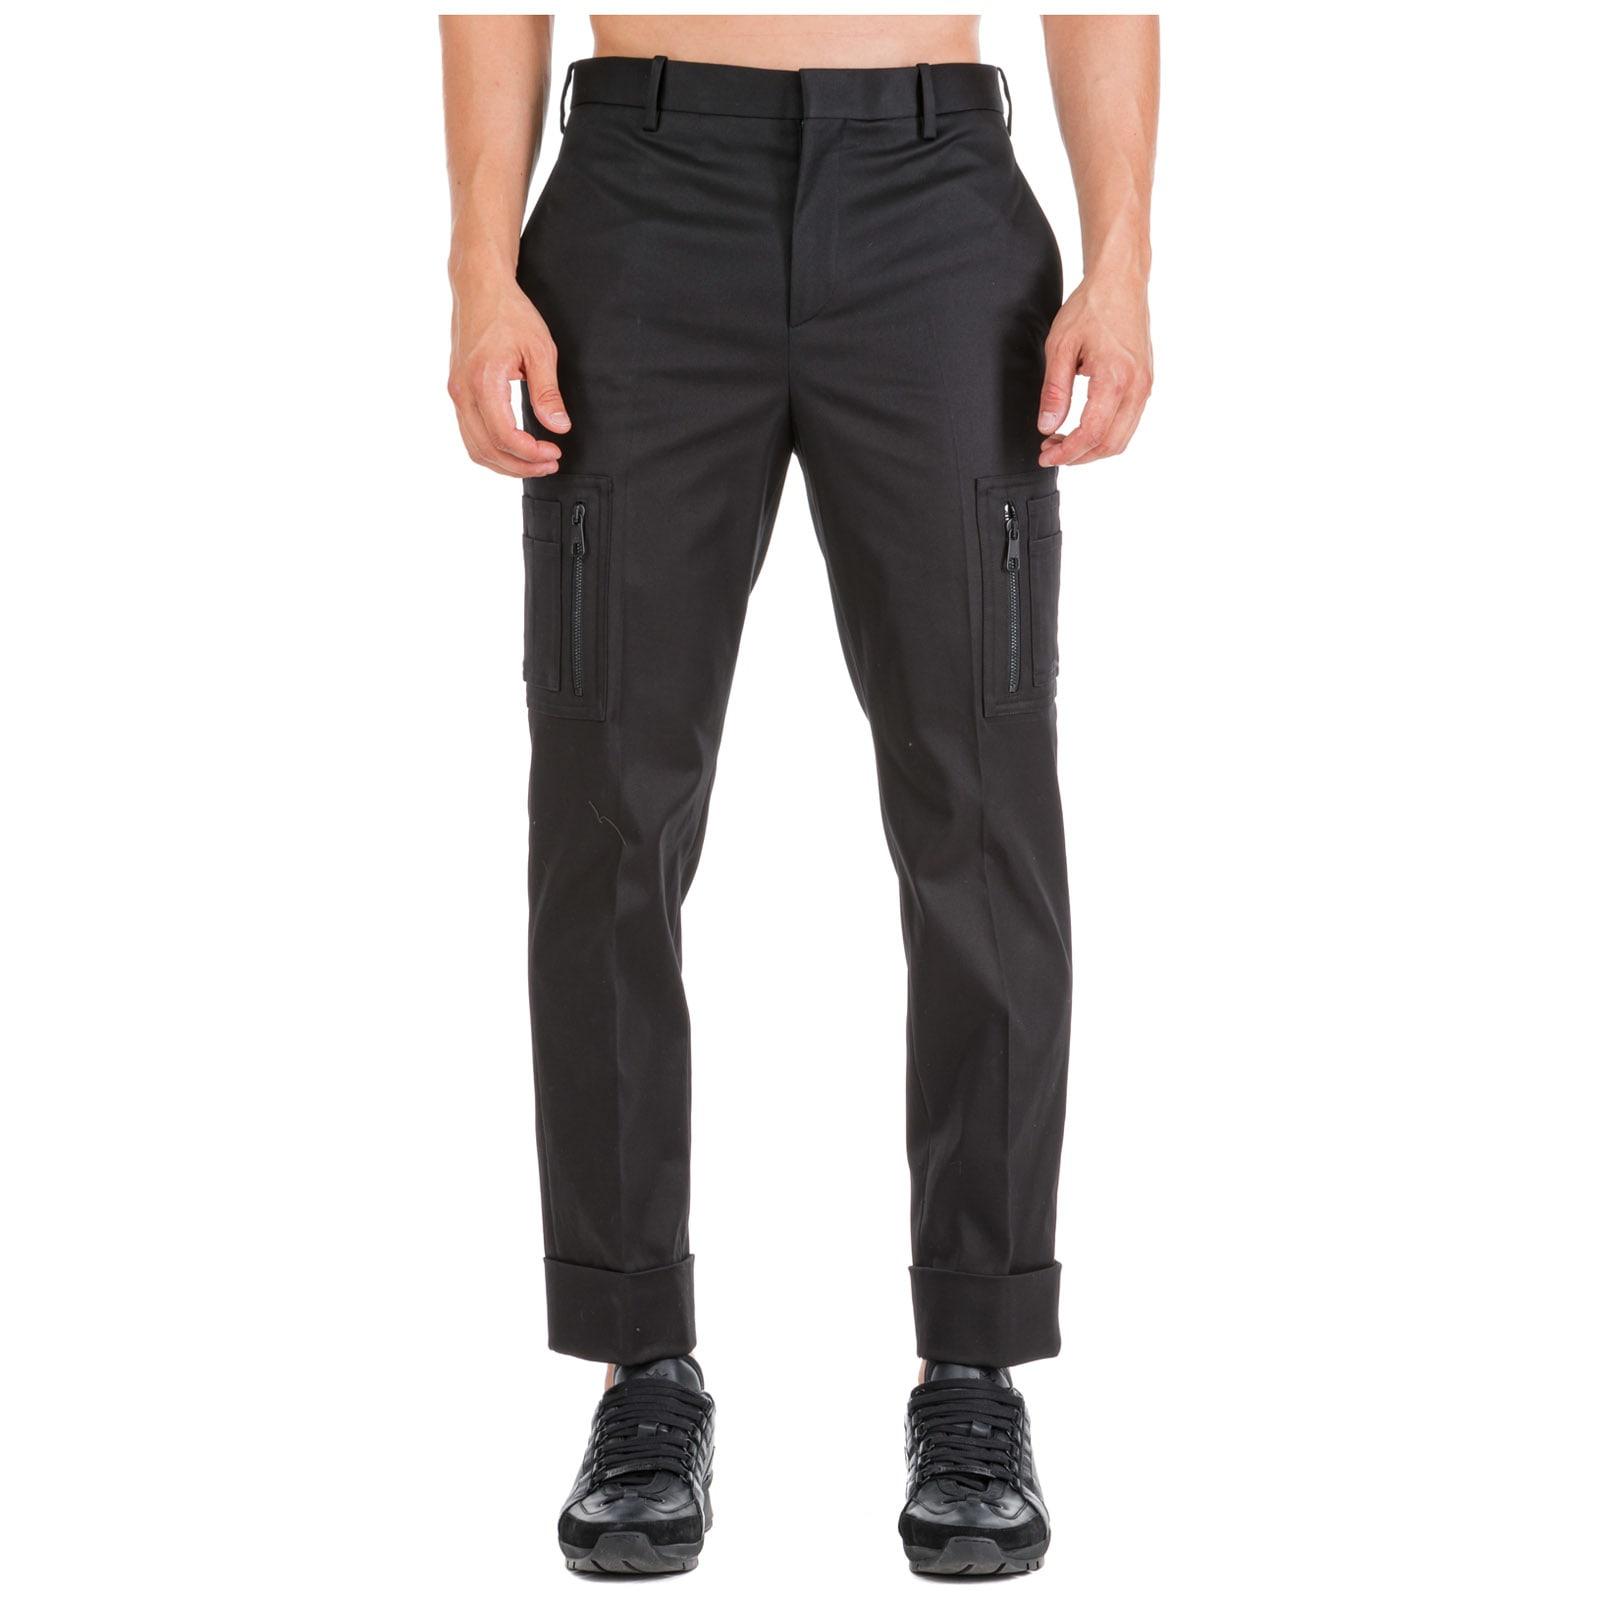 Neil Barrett Universal Globe Trousers